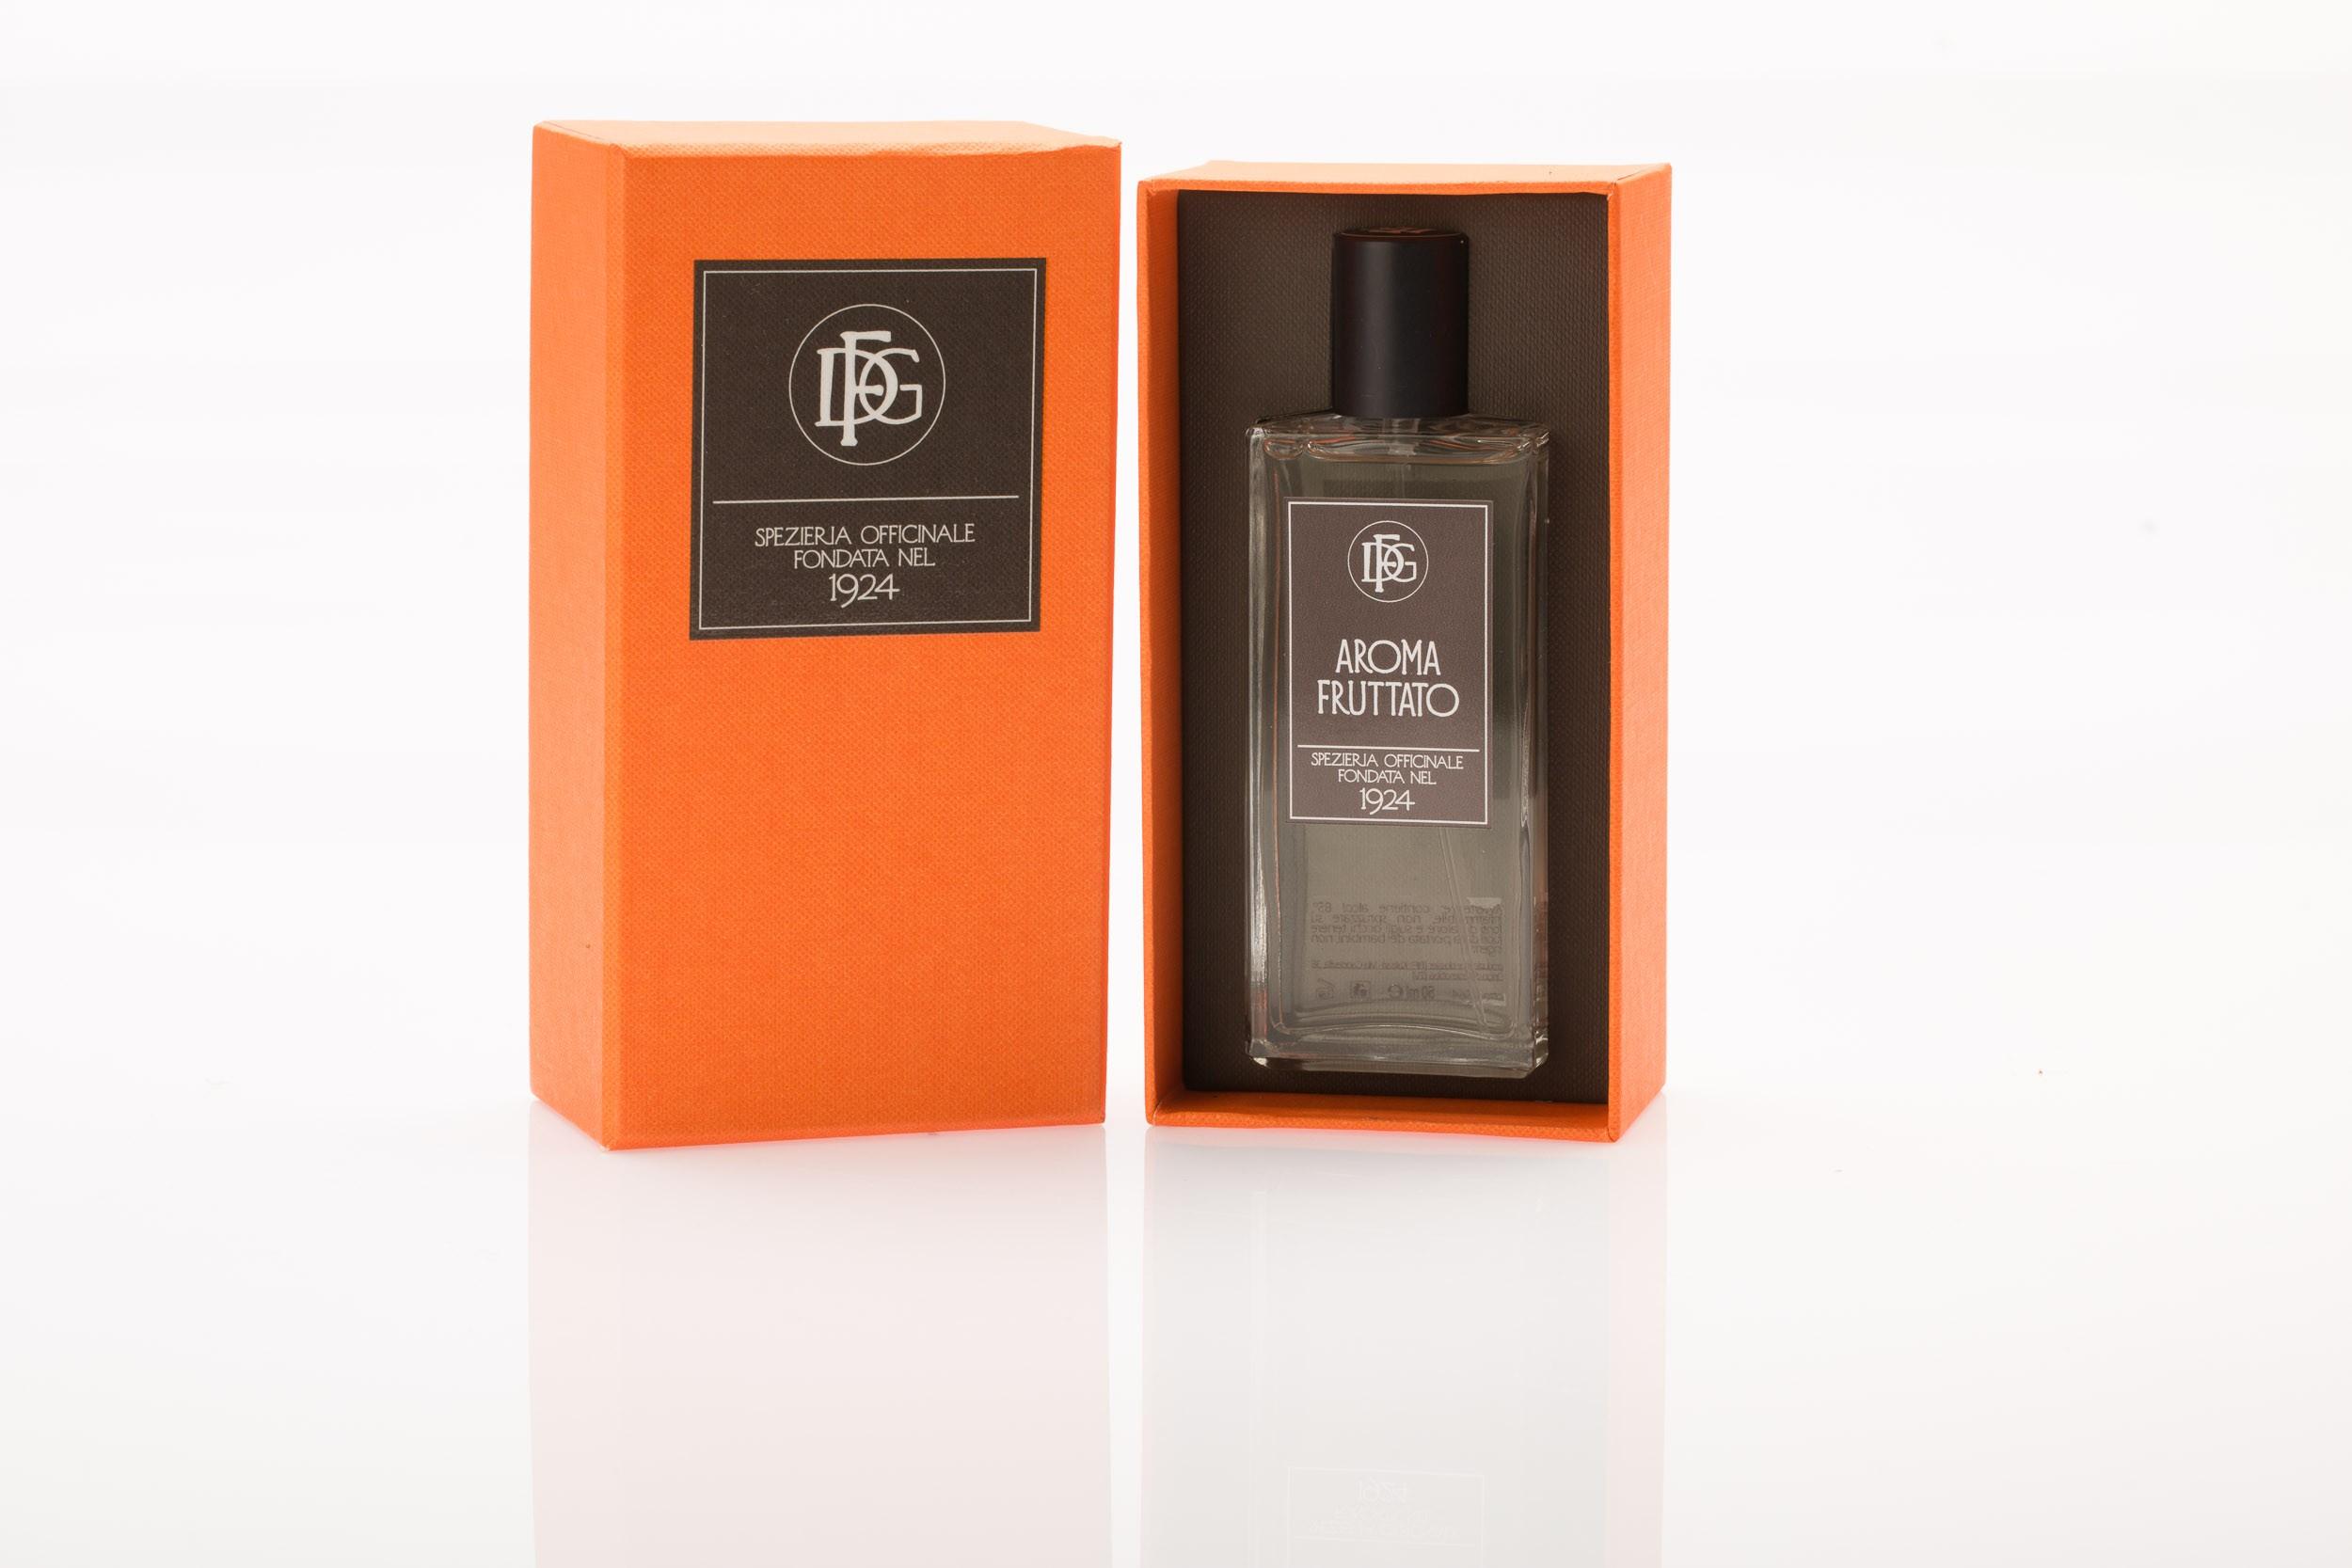 DFG1924 Aroma Fruttato аромат для женщин